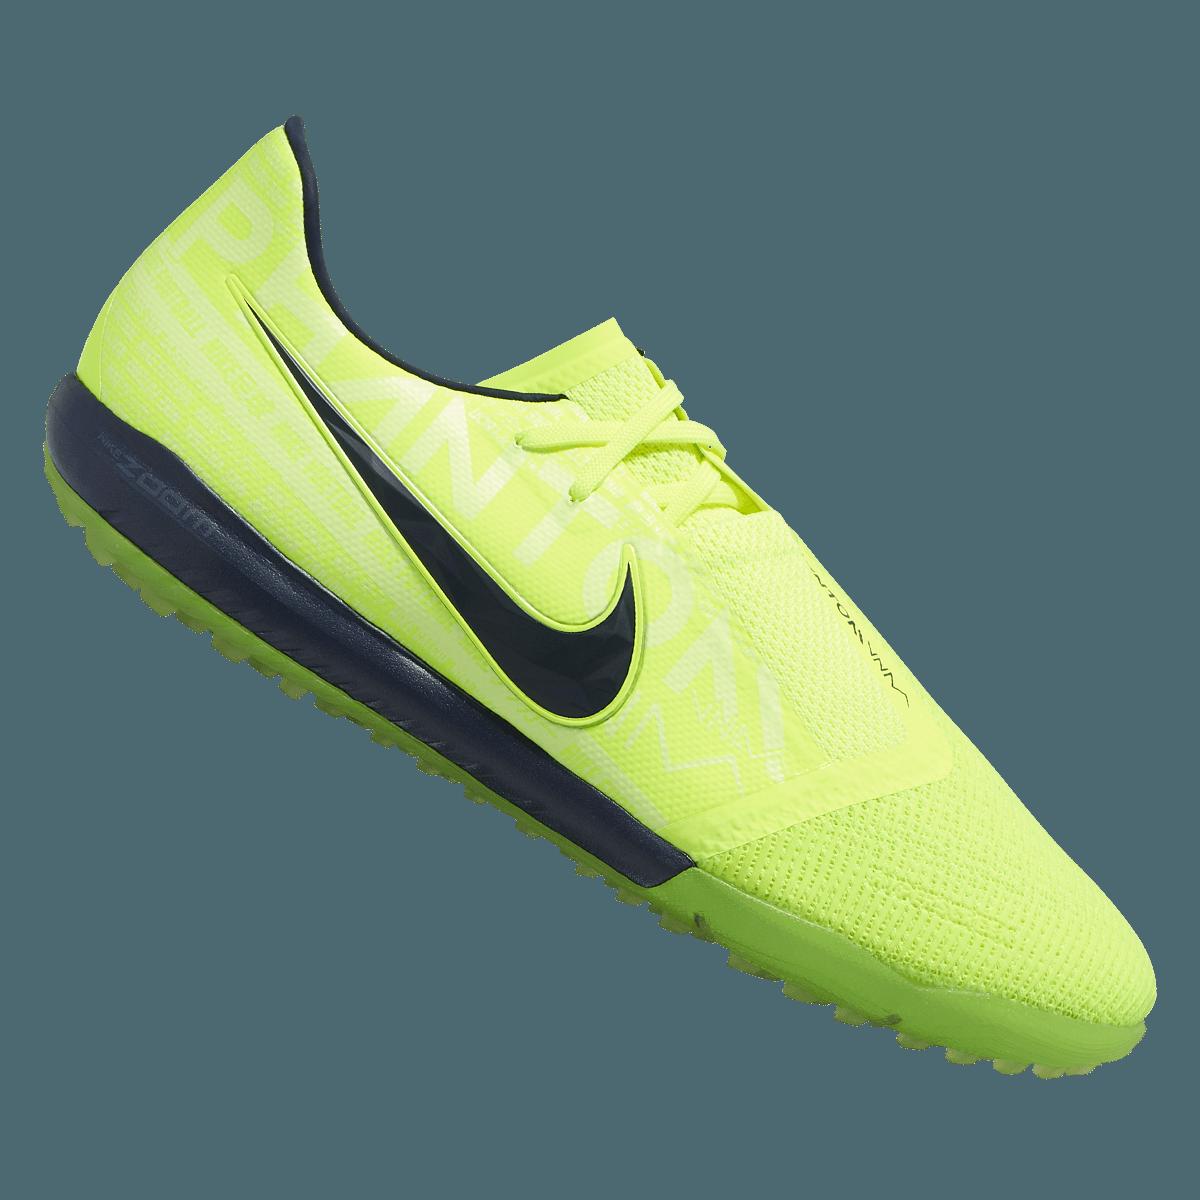 Nike TF fluodunkelblau Venom Kunstrasen Pro gelb Zoom Fußballschuh Phantom q5c4j3RAL